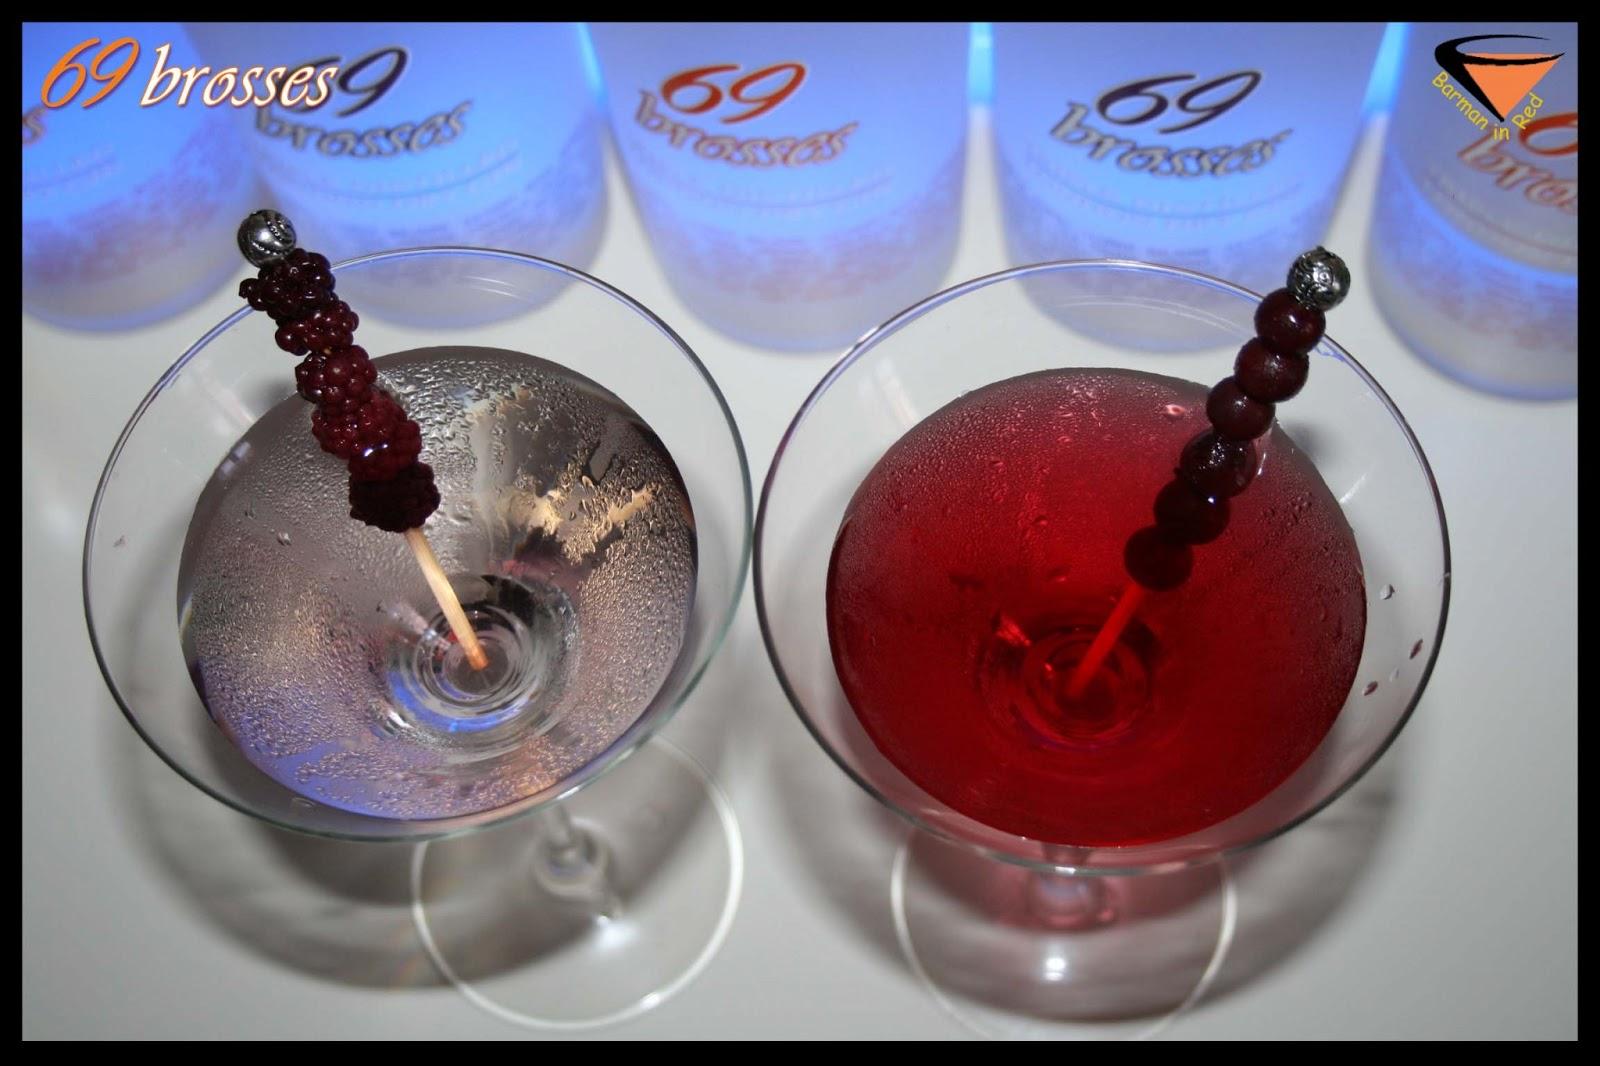 69 brosses gin